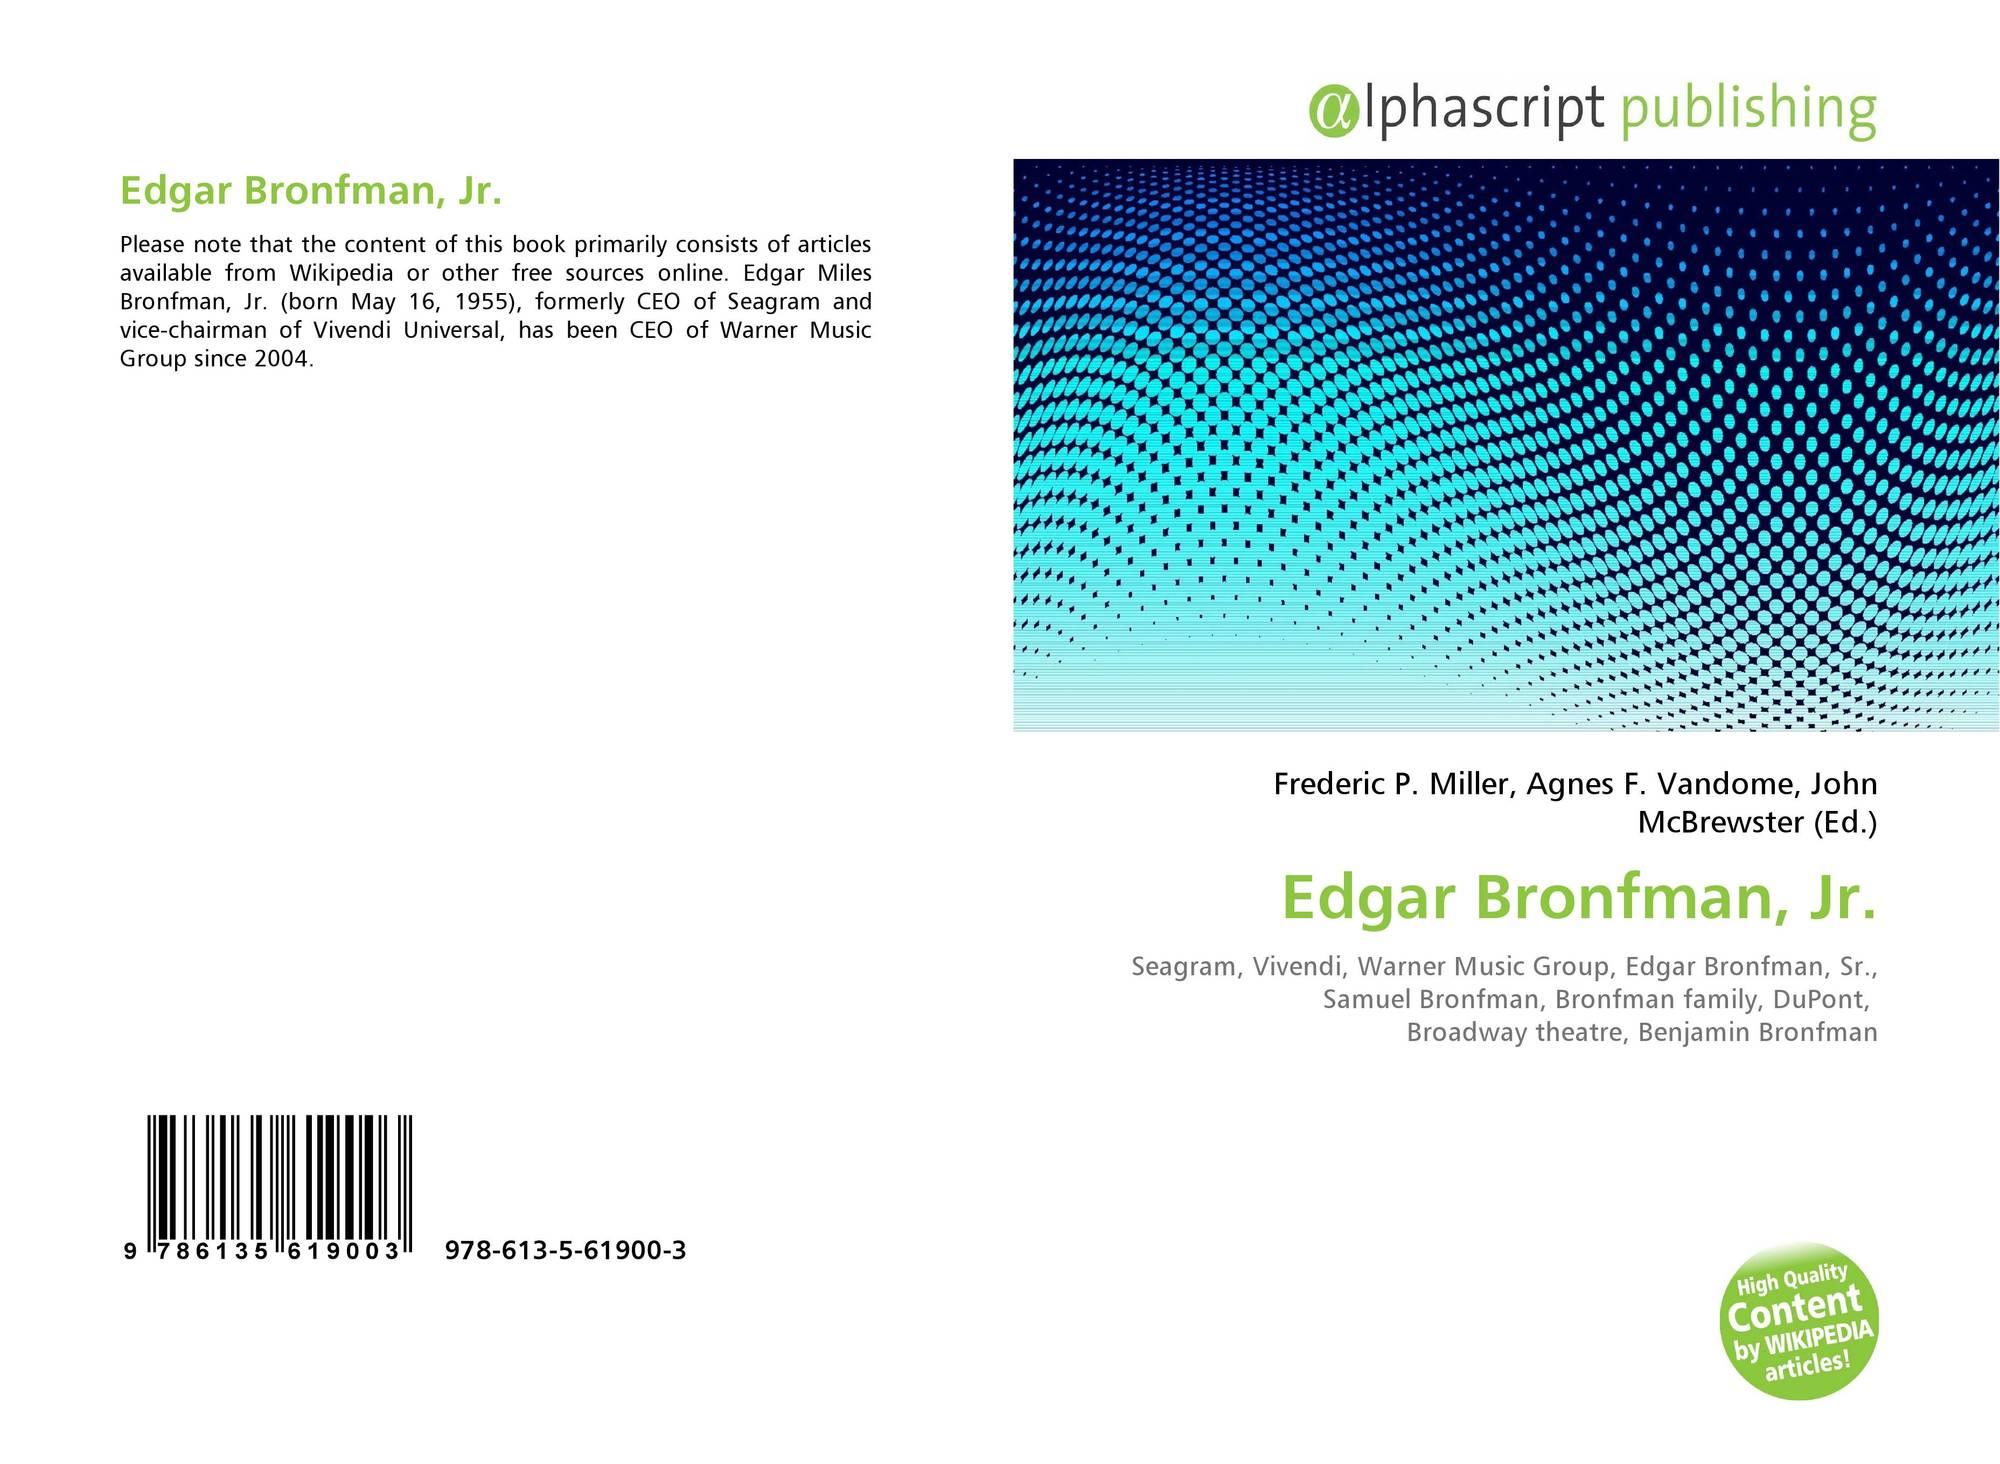 Edgar Bronfman, Jr , 978-613-5-61900-3, 6135619004